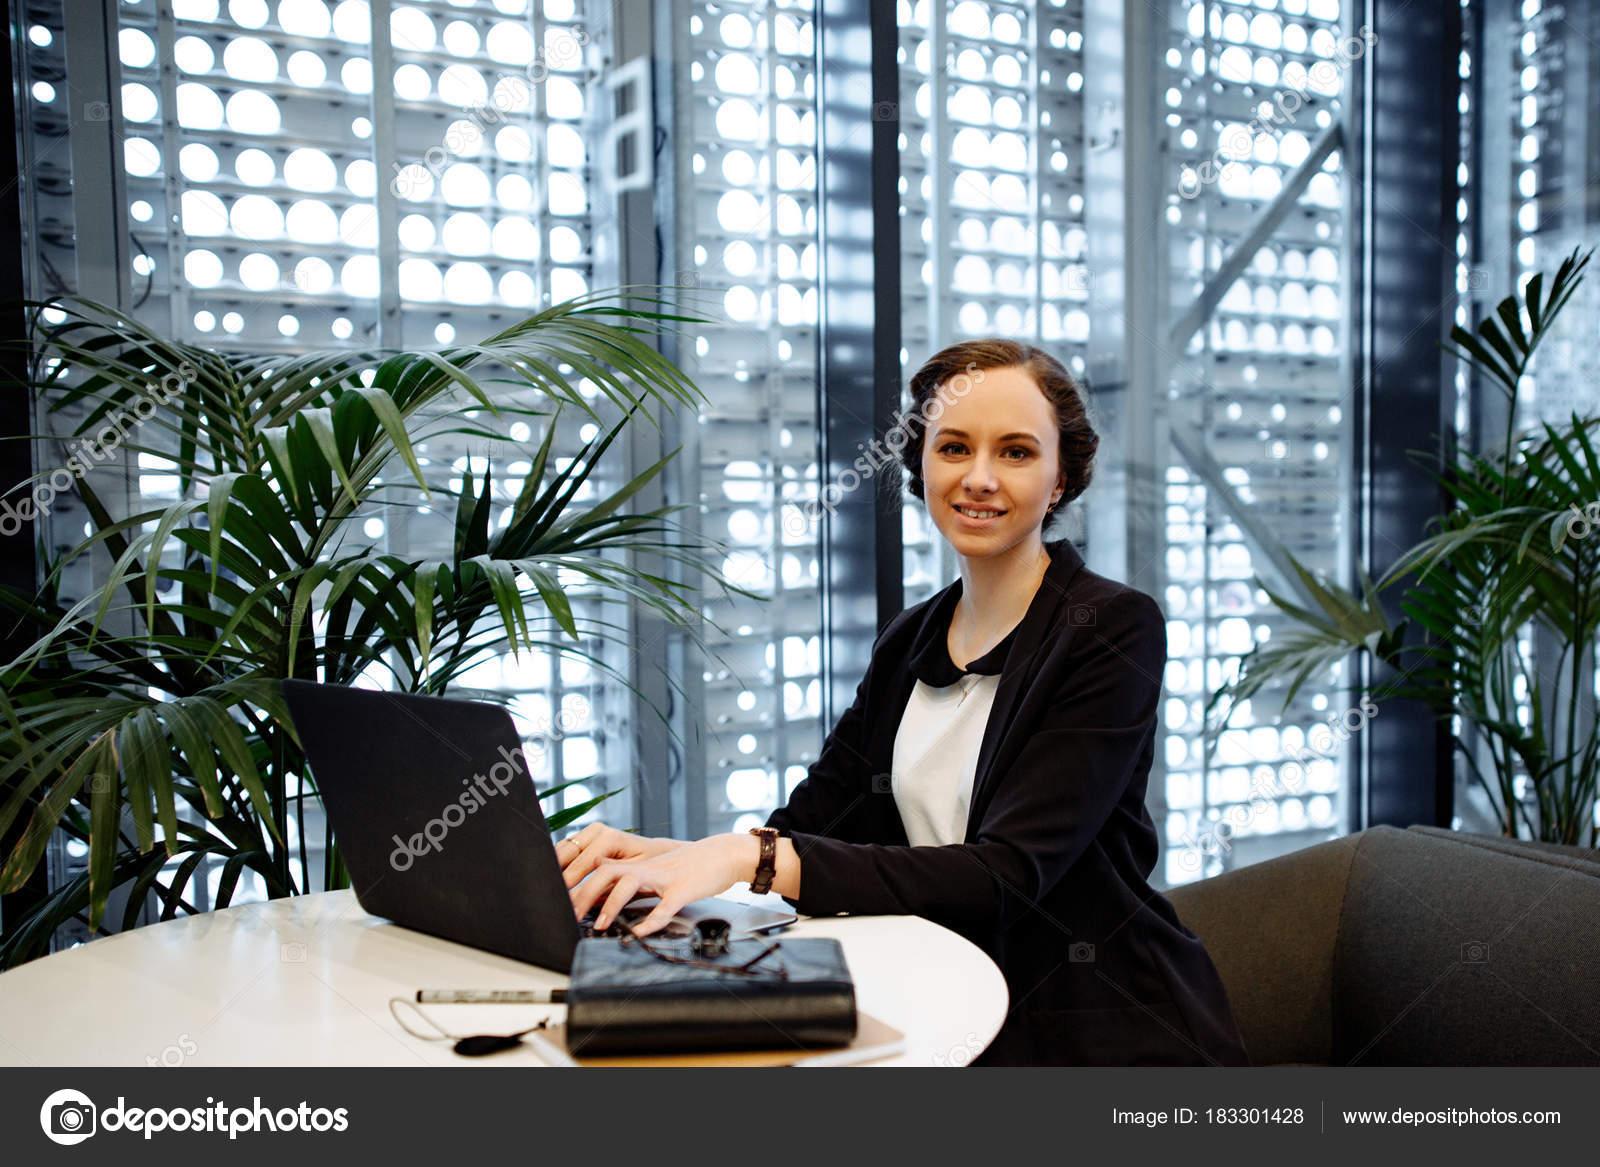 66e466a17bb5 Πορτραίτο Της Επιχείρησης Γυναίκα Των Επιχειρήσεων Συλλέγονται ...